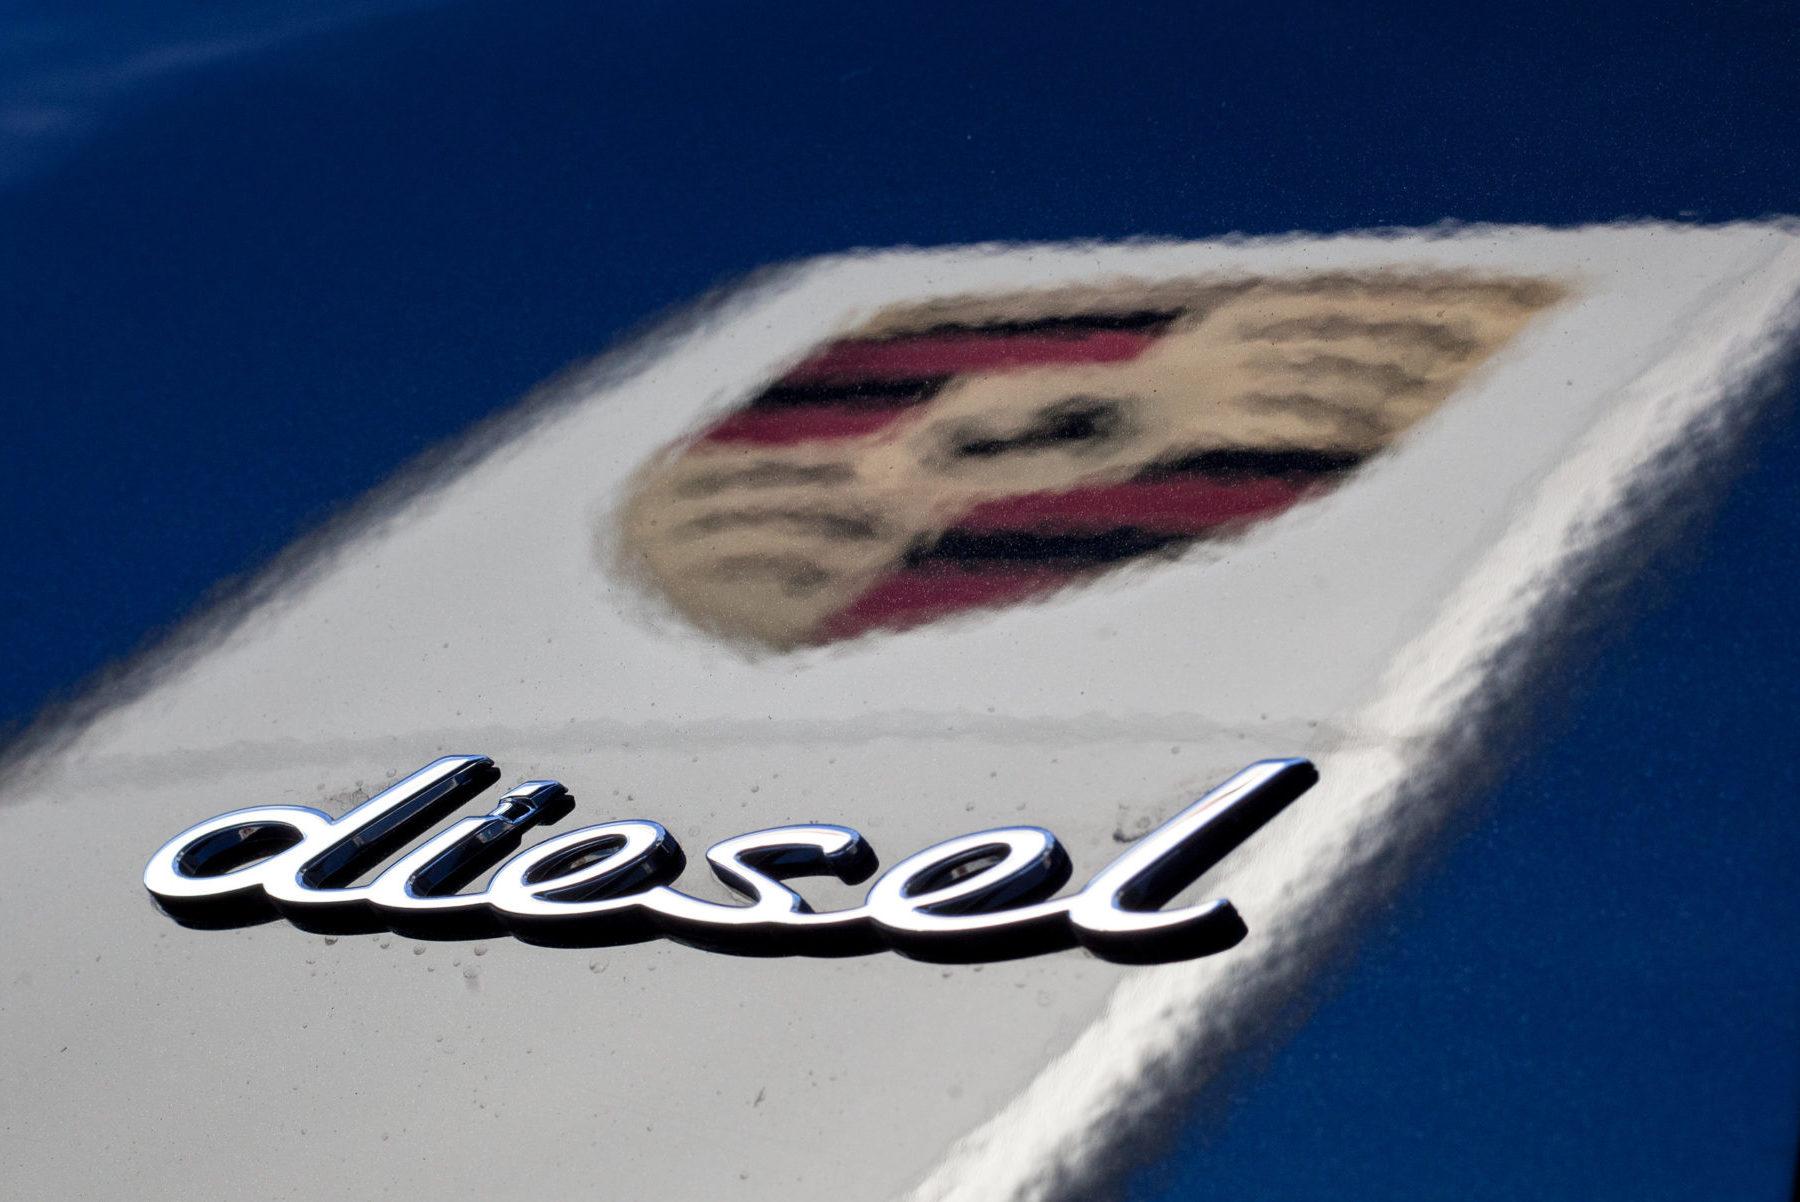 O abandono do Diesel foi confirmado oficialmente pela marca